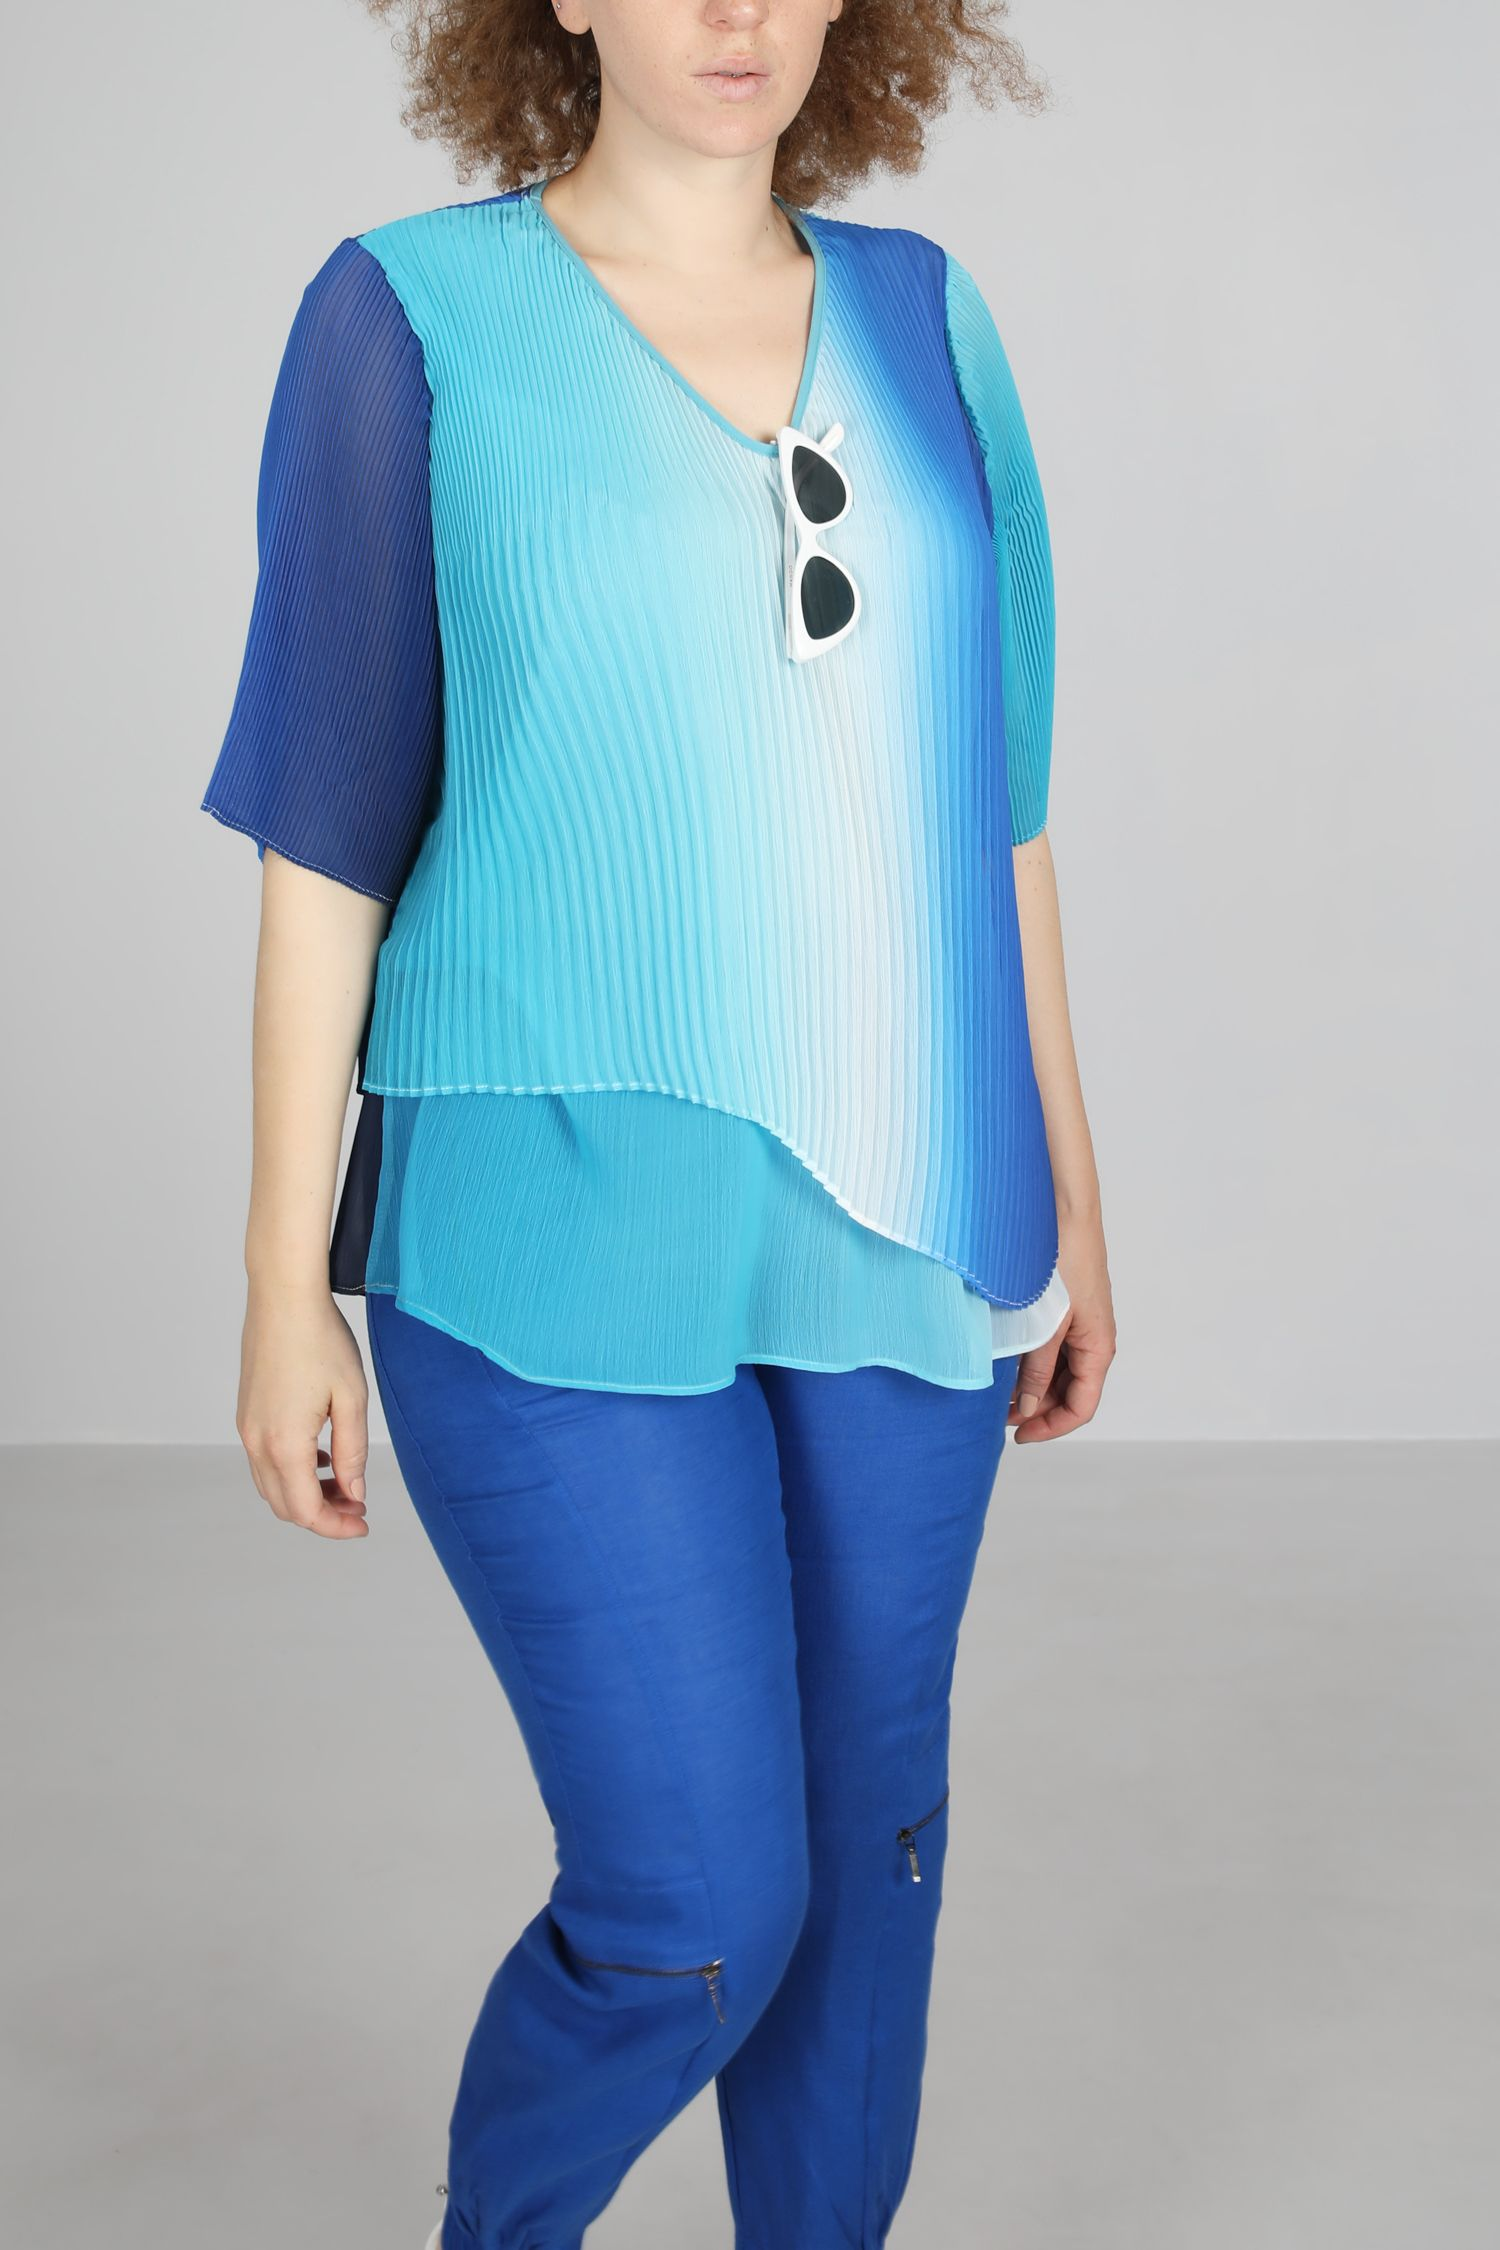 T shirt-Turquoiser/t&dye